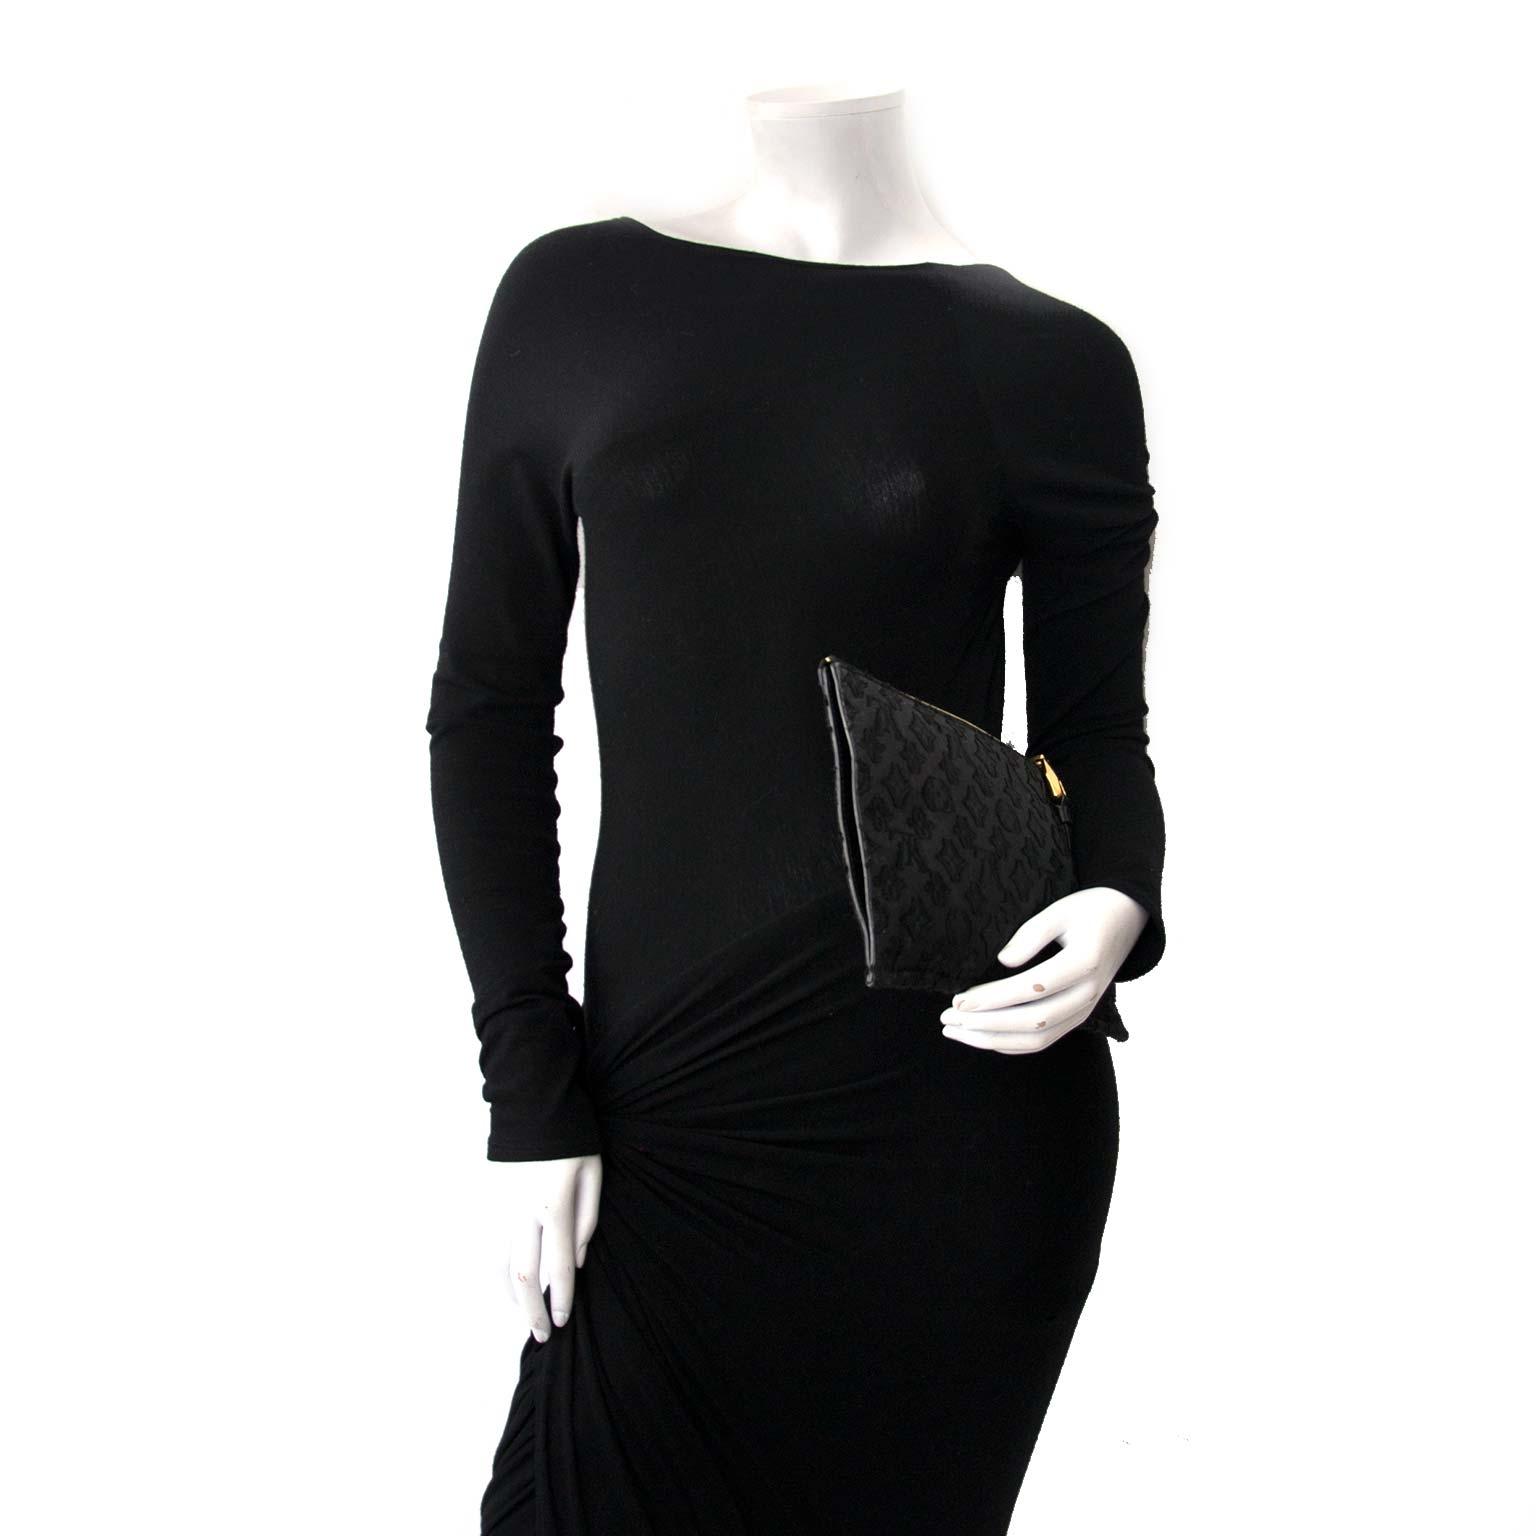 Buy your authentic Louis Vuitton Limited Edition Monogram Fabric Clutch Pochette